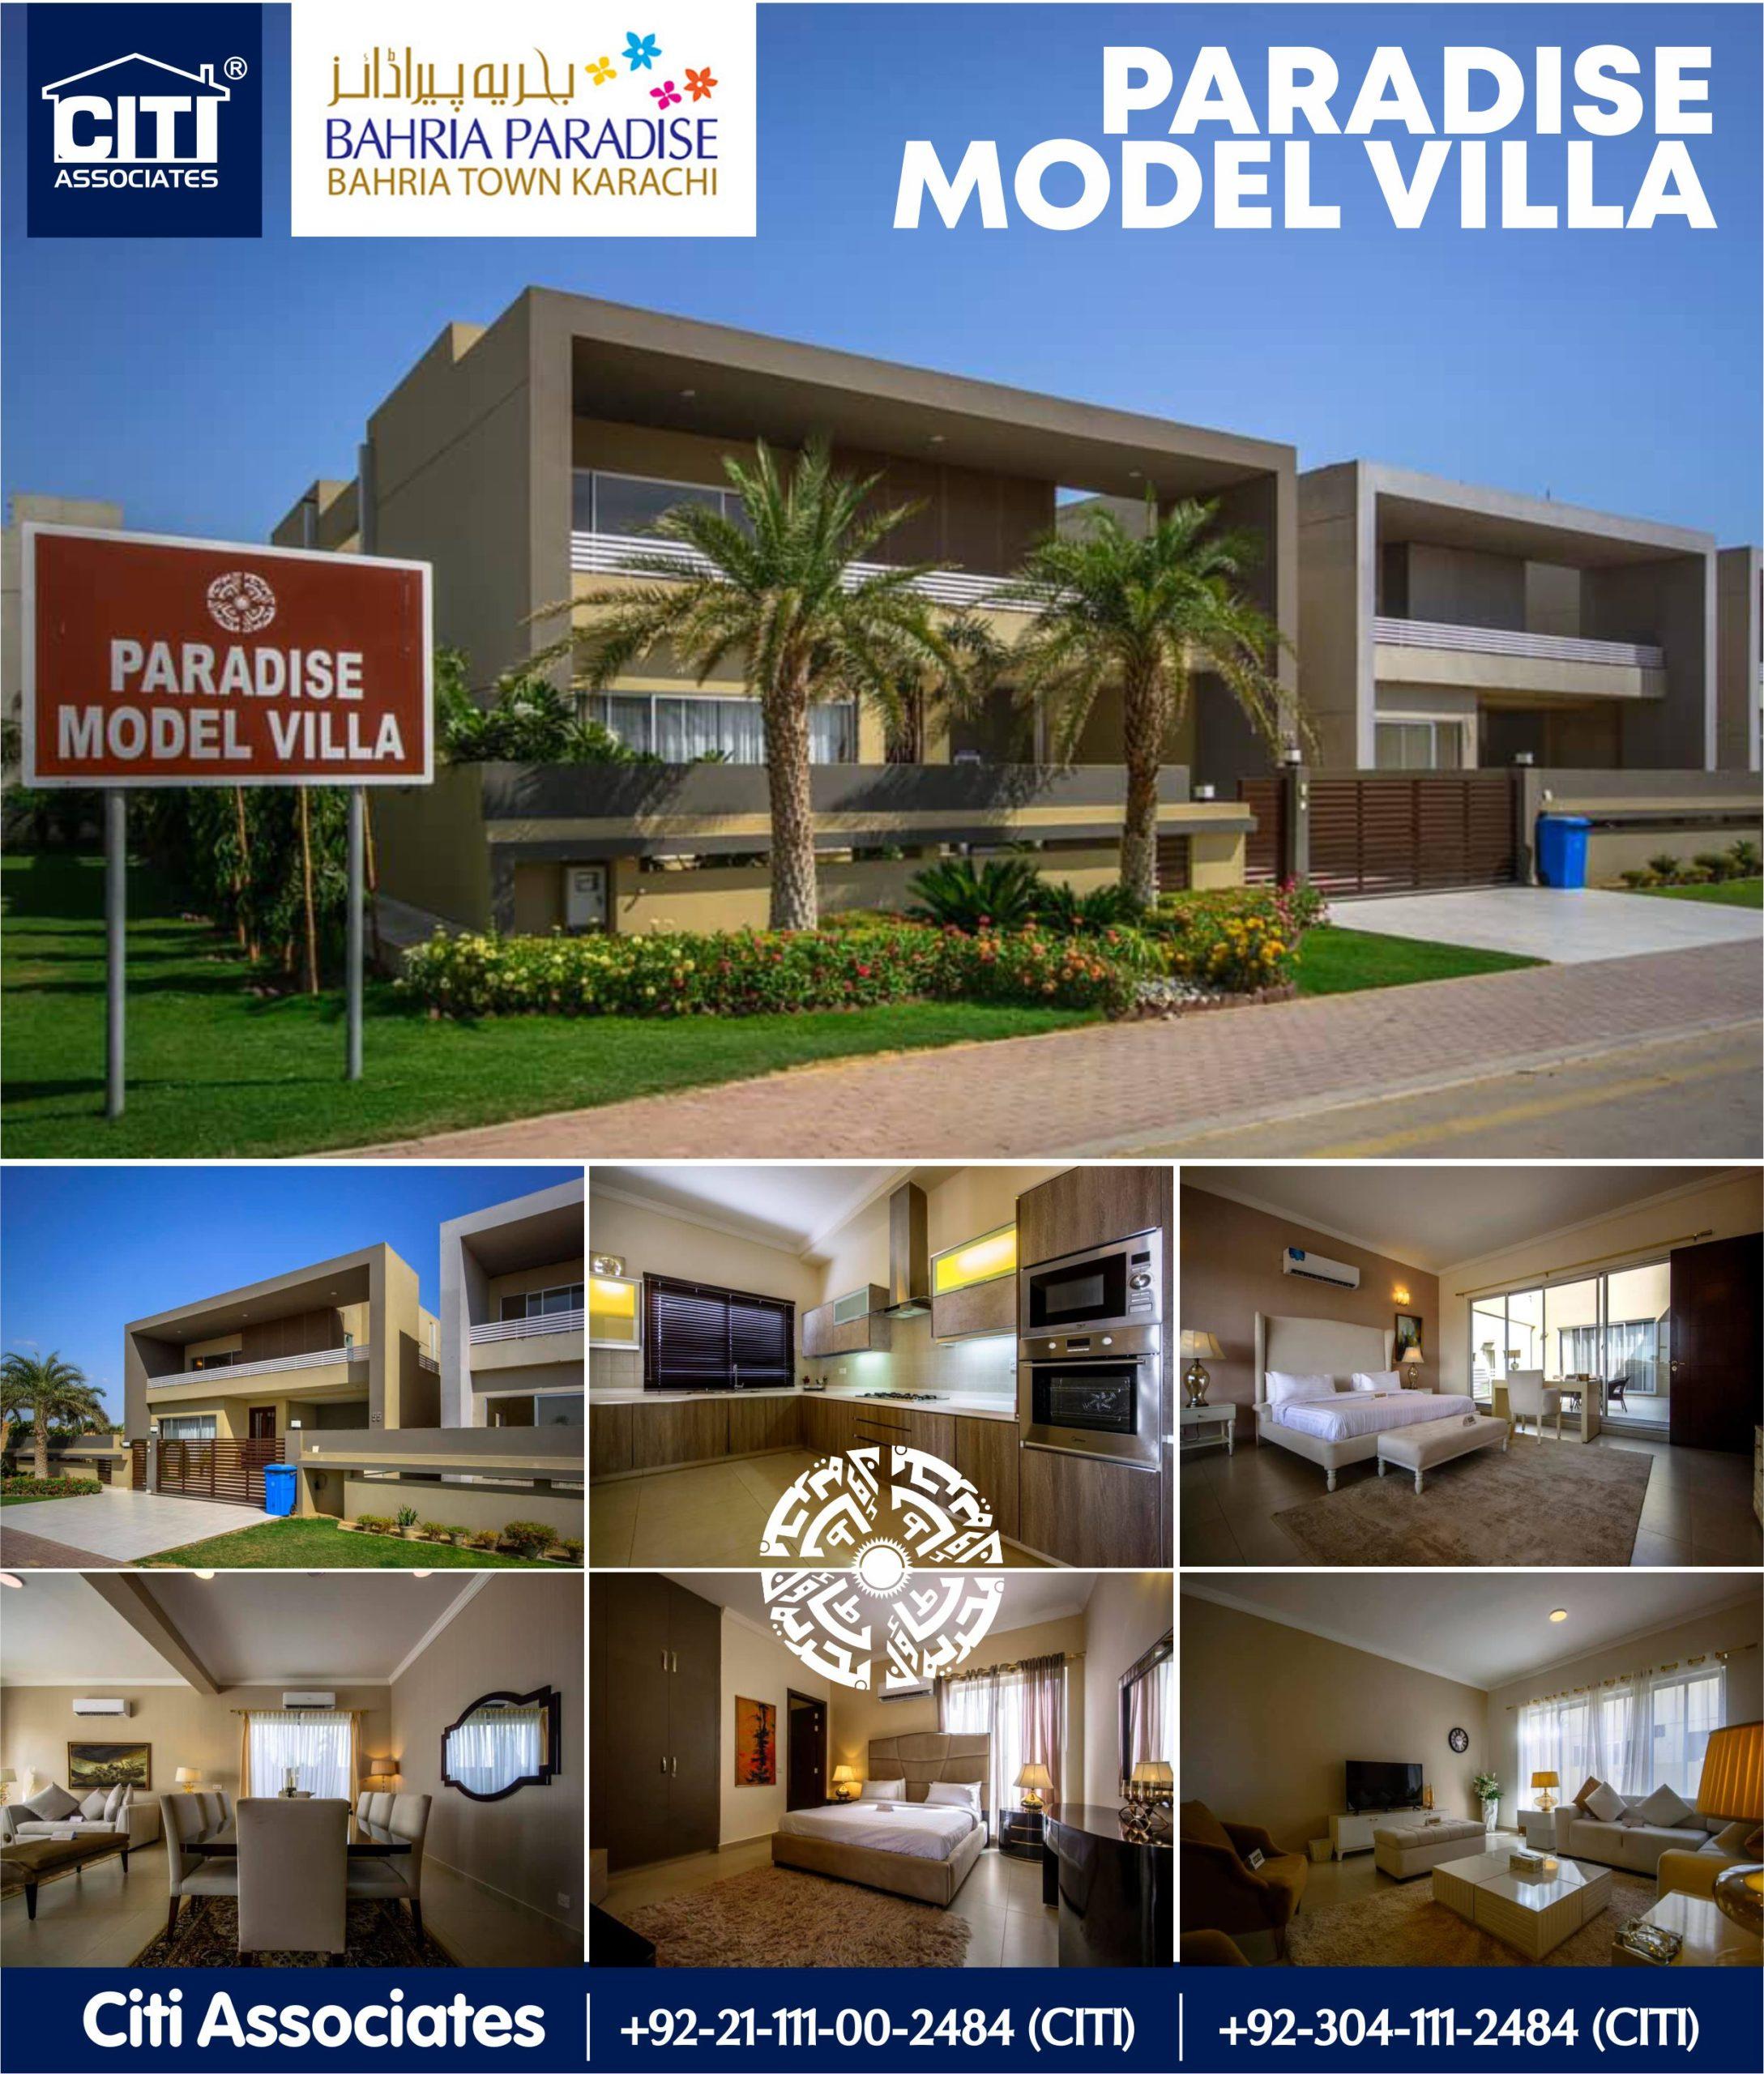 Bahria Paradise Model Villa | Bahria Town Karachi